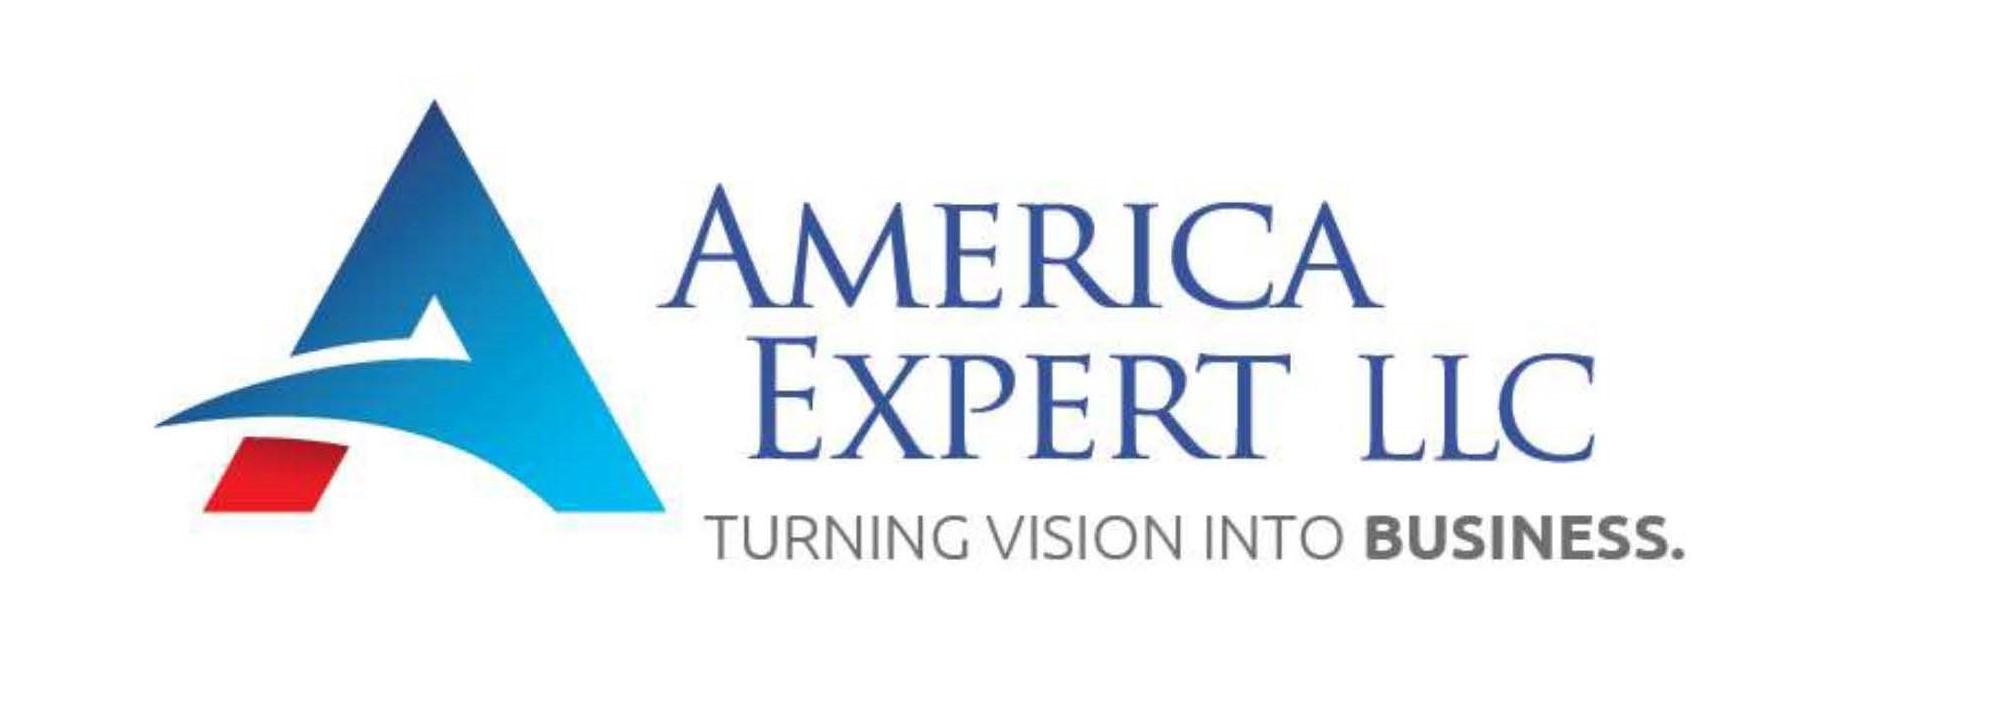 America Expert LLC